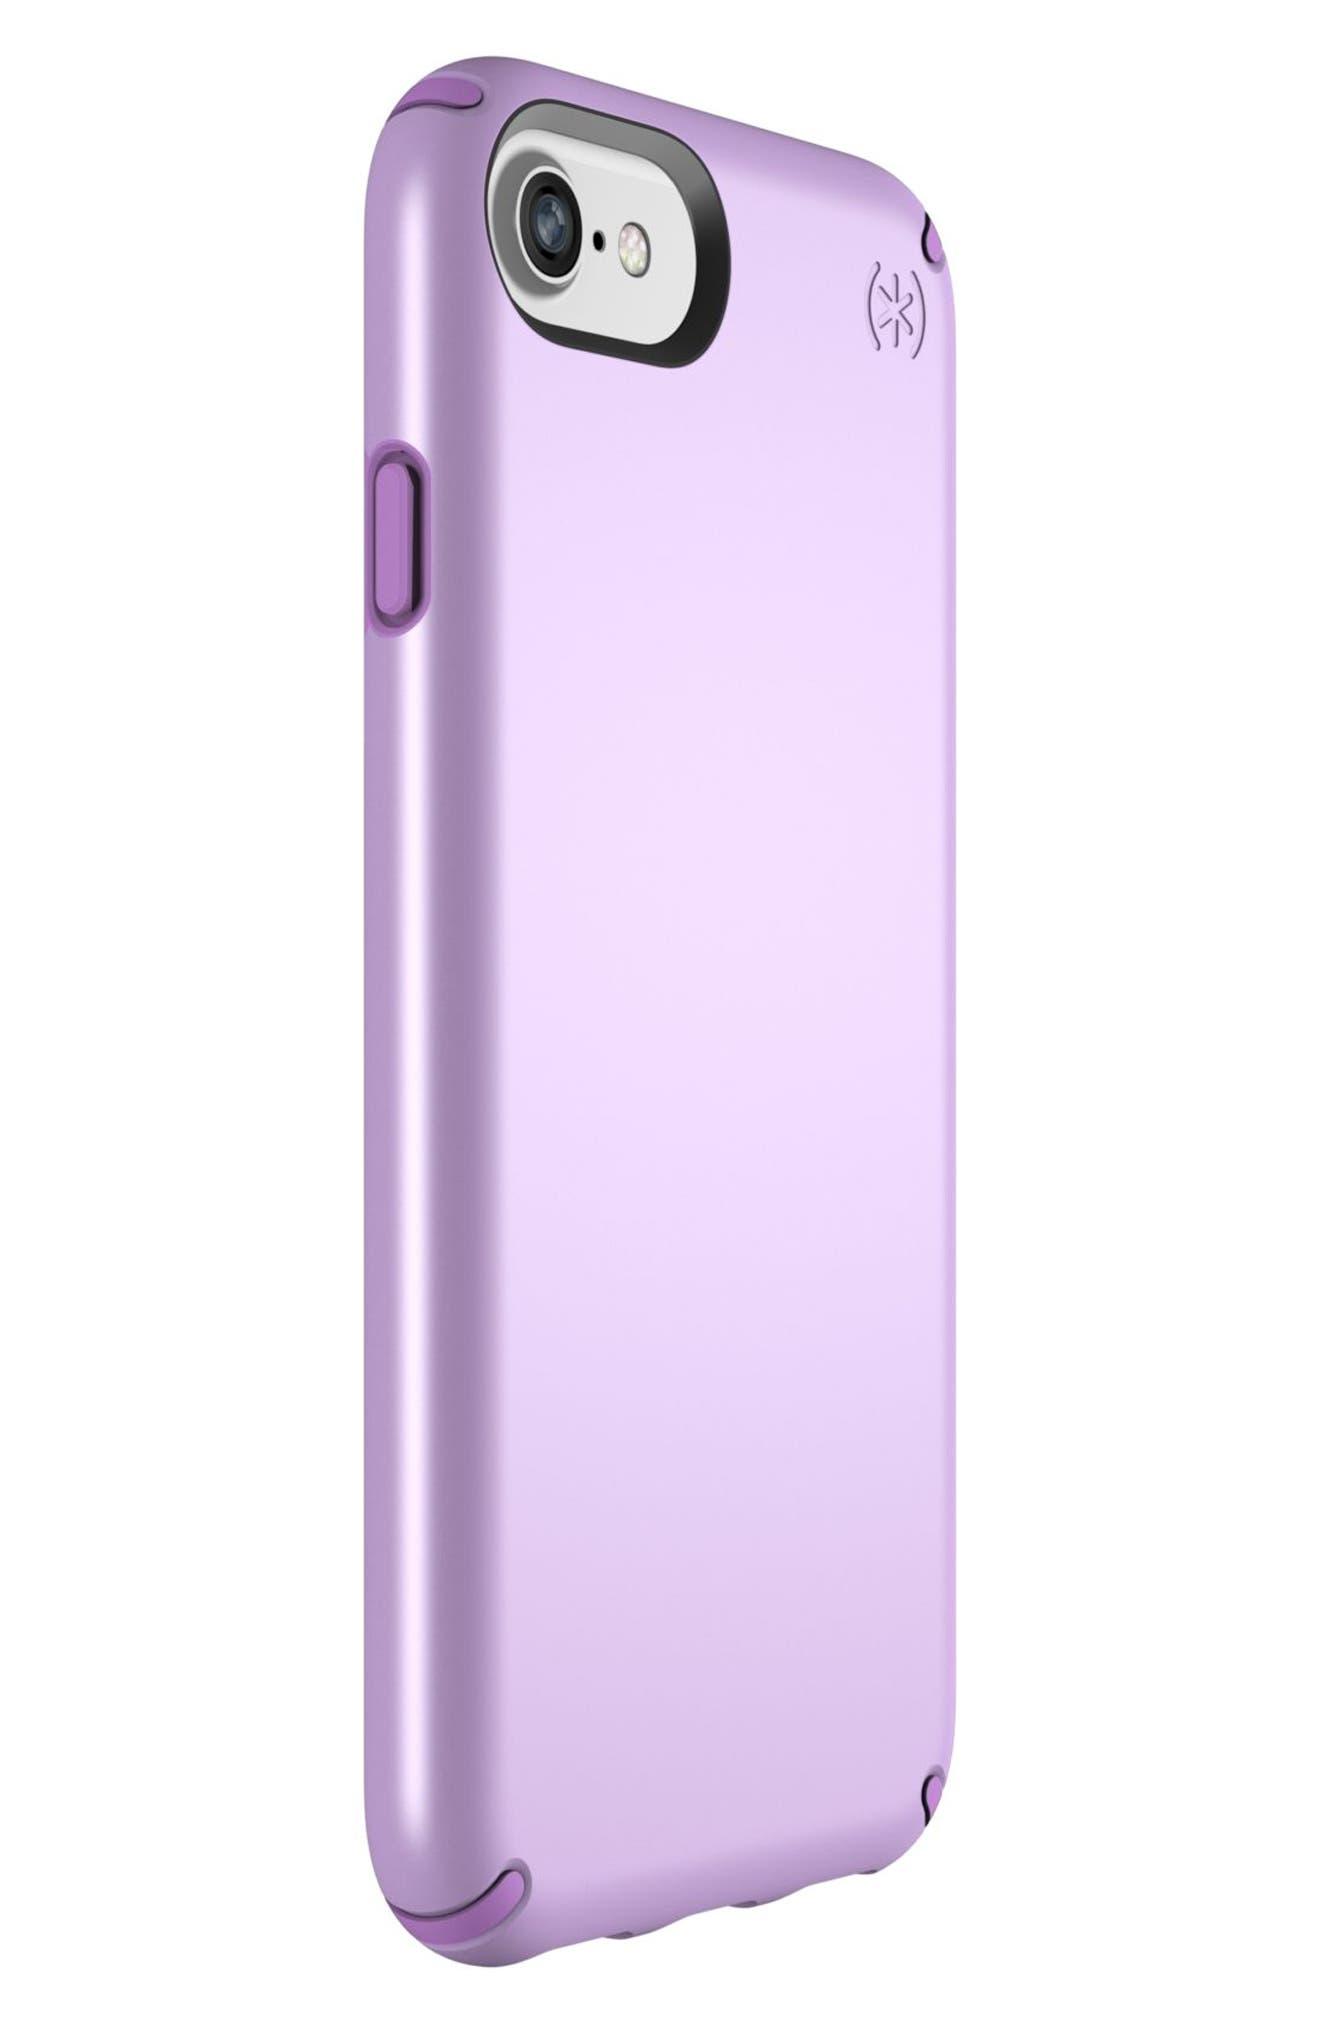 iPhone 6/6s/7/8 Case,                             Alternate thumbnail 3, color,                             Taro Purple Metallic/ Purple